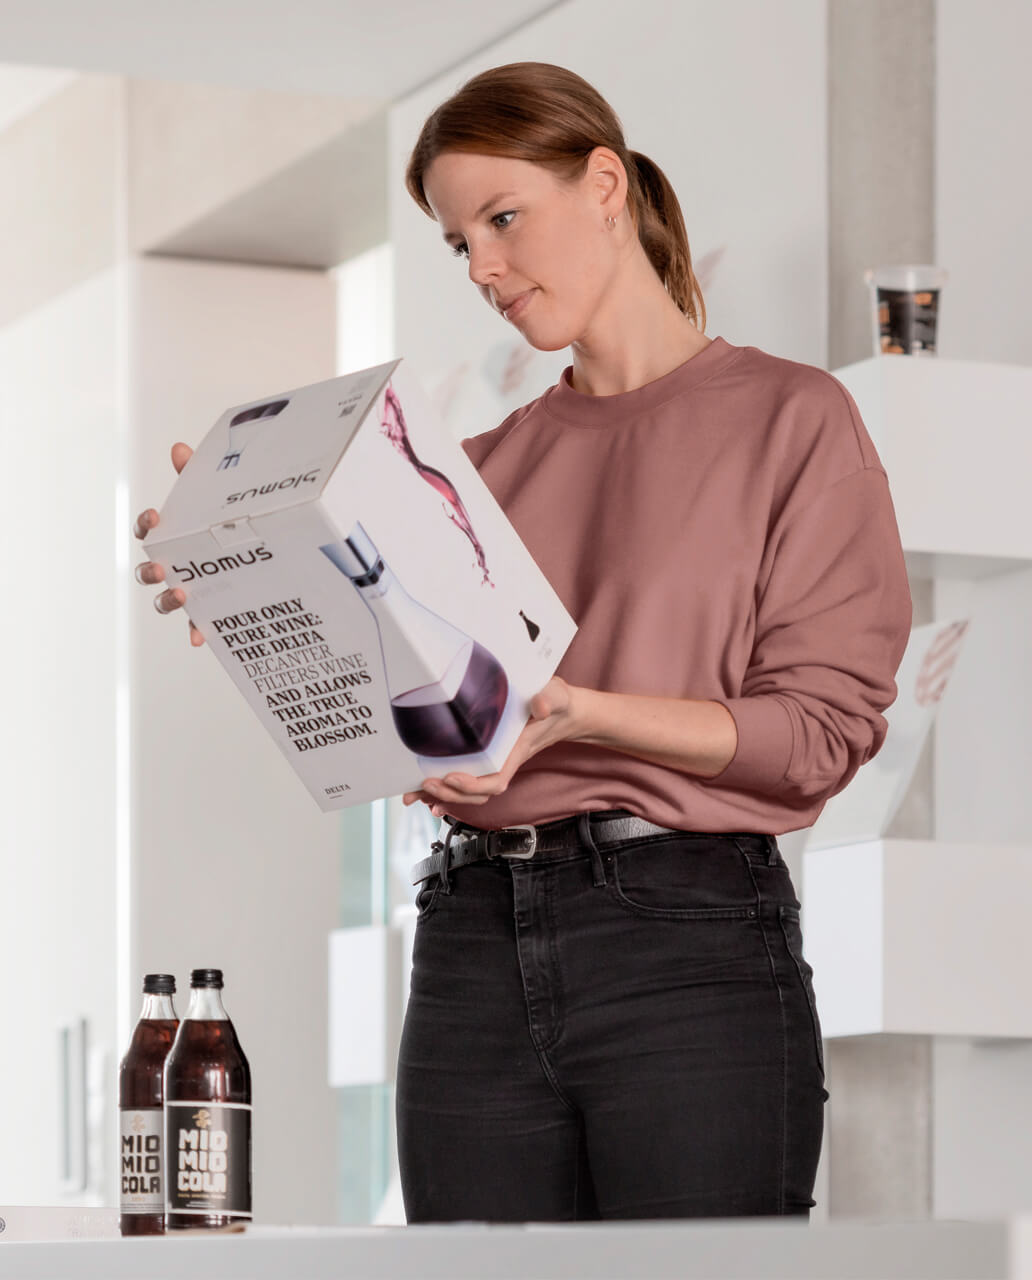 cyclos profil experience design packaging verpackung marketingkonzept markenrelaunch kreativagentur strategieberatung